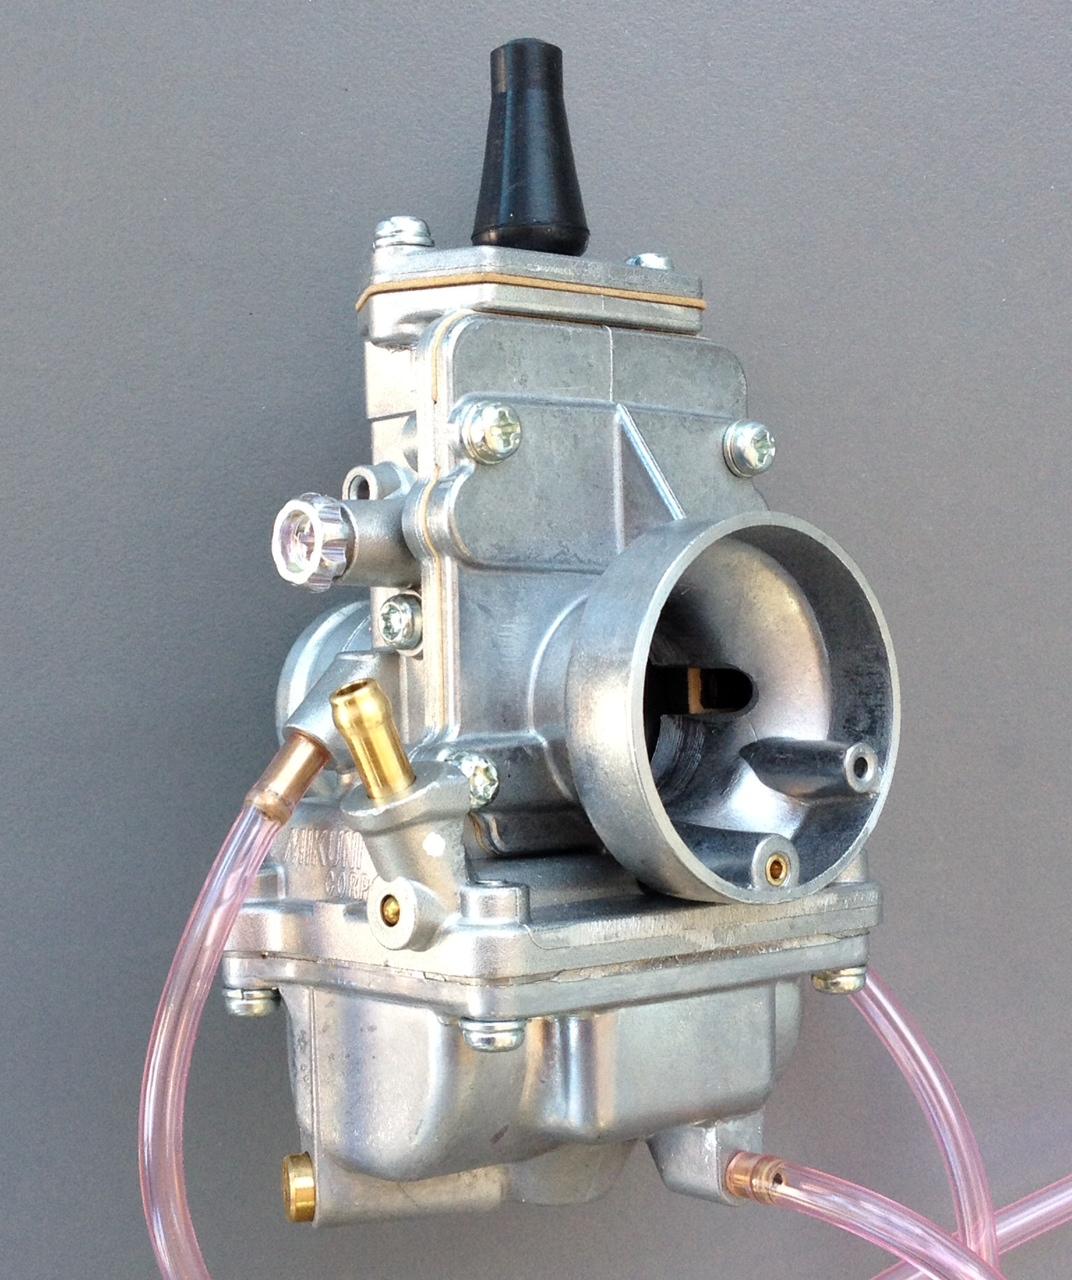 1  TM24-8001 Mikuni TM 24mm Flatslide Carburetor